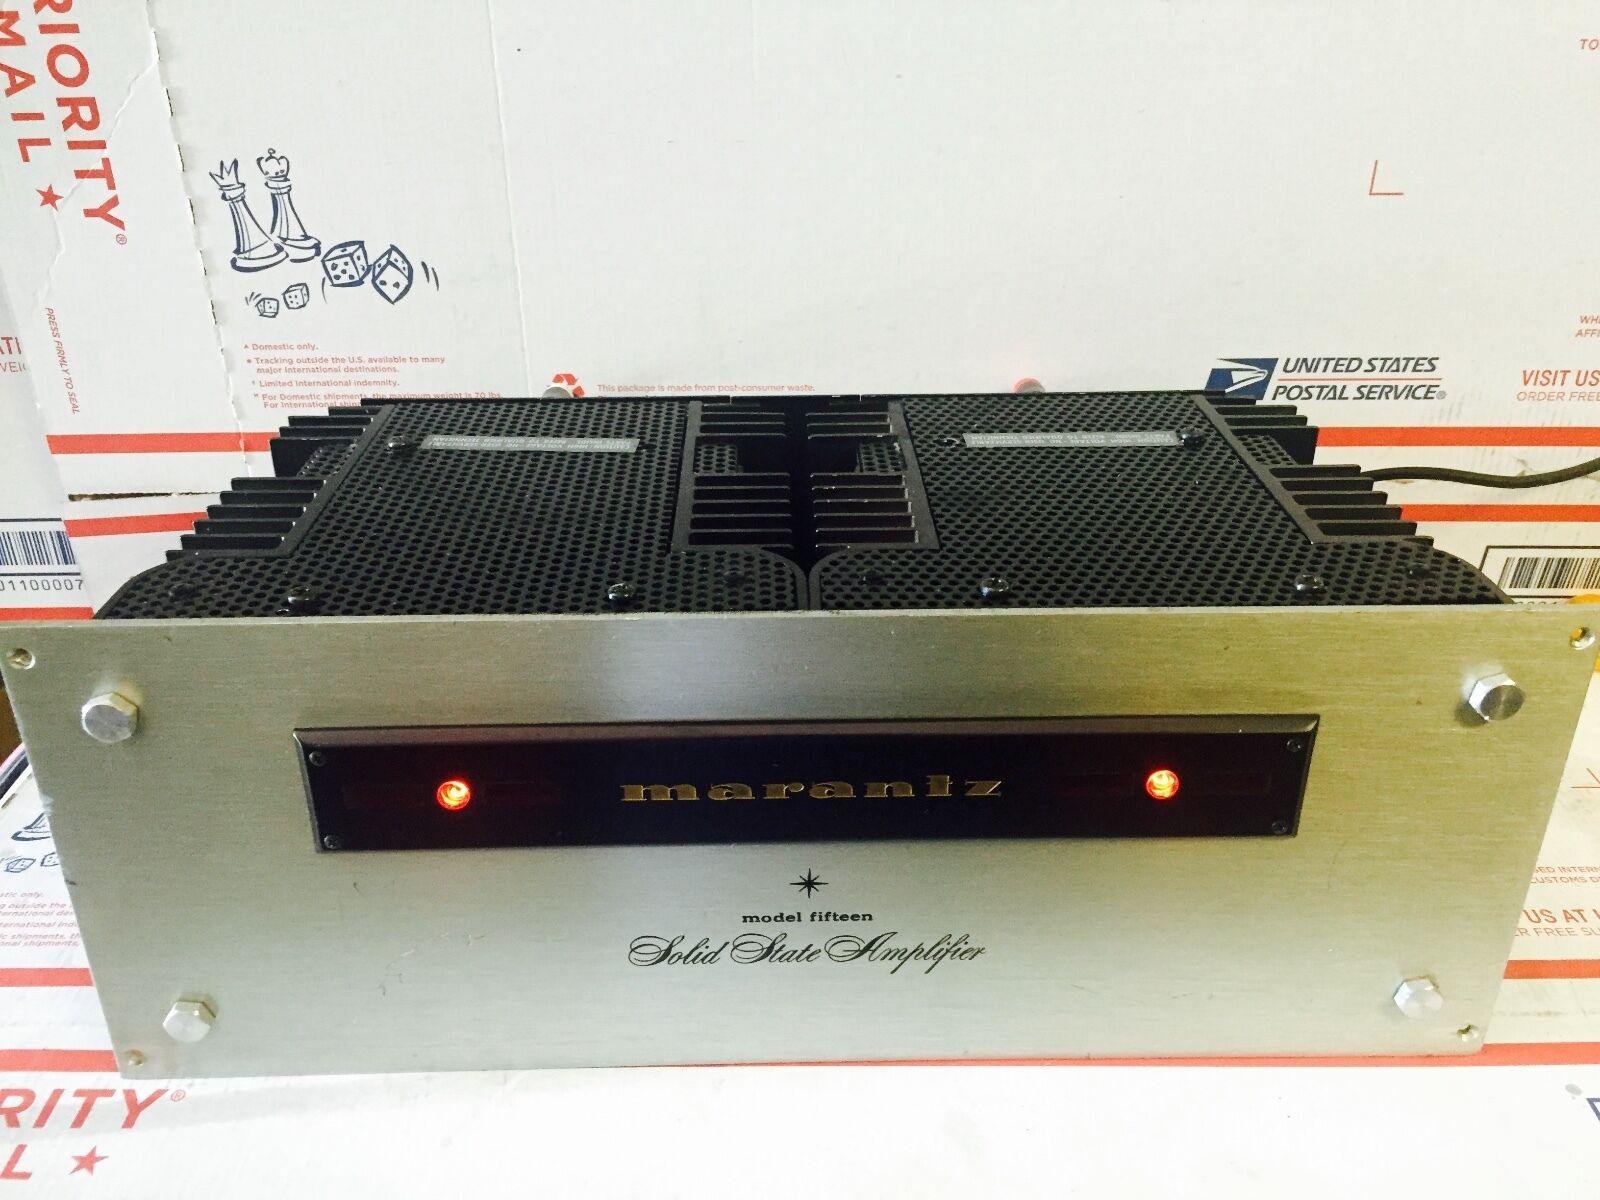 Marantz Model Fifteen 15 Power Amplifier Stereo Amp | Wundr-Shop